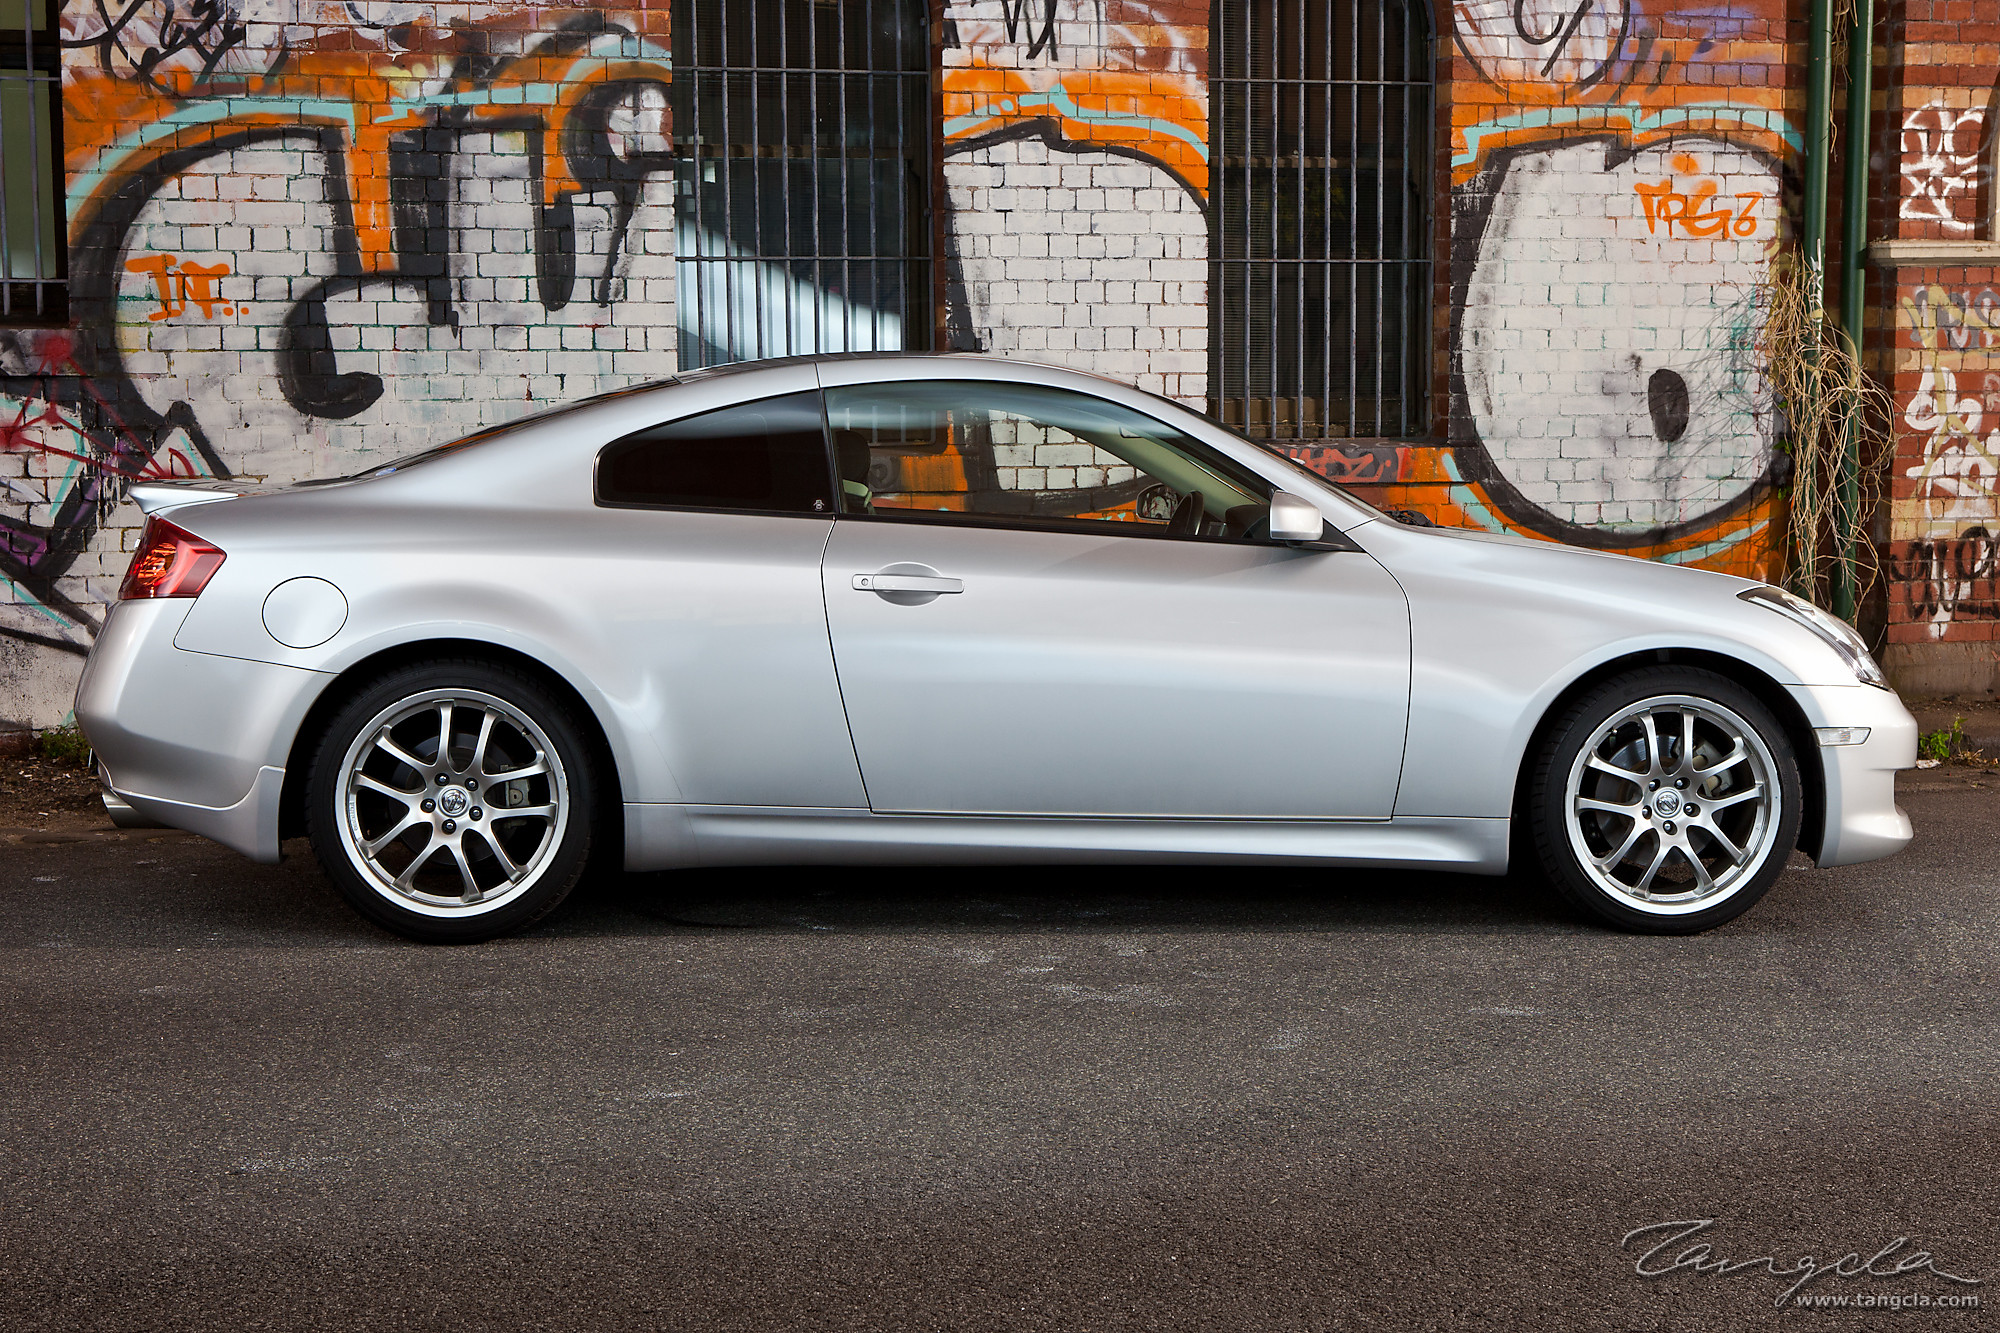 2006 nissan 350gt series 3 v35 skyline coupe find me cars 2006 nissan 350gt series 3 v35 skyline coupe vanachro Images